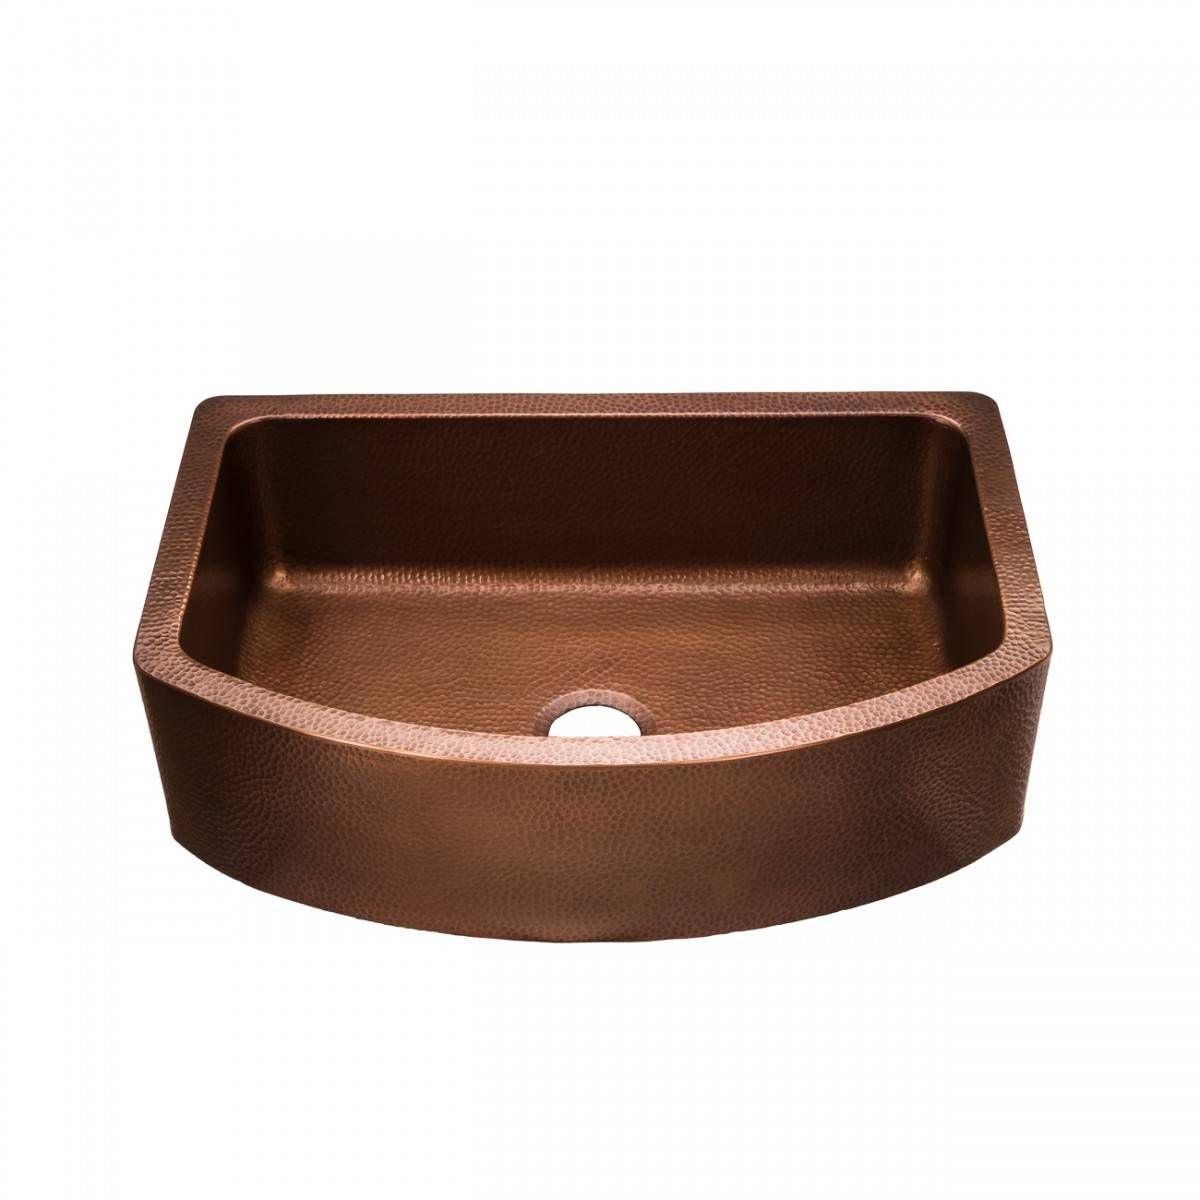 33 Inch Copper Single Bowl Apron Farmhouse Sink Farmhouse Apron Sink Farmhouse Sink Copper Farmhouse Sinks